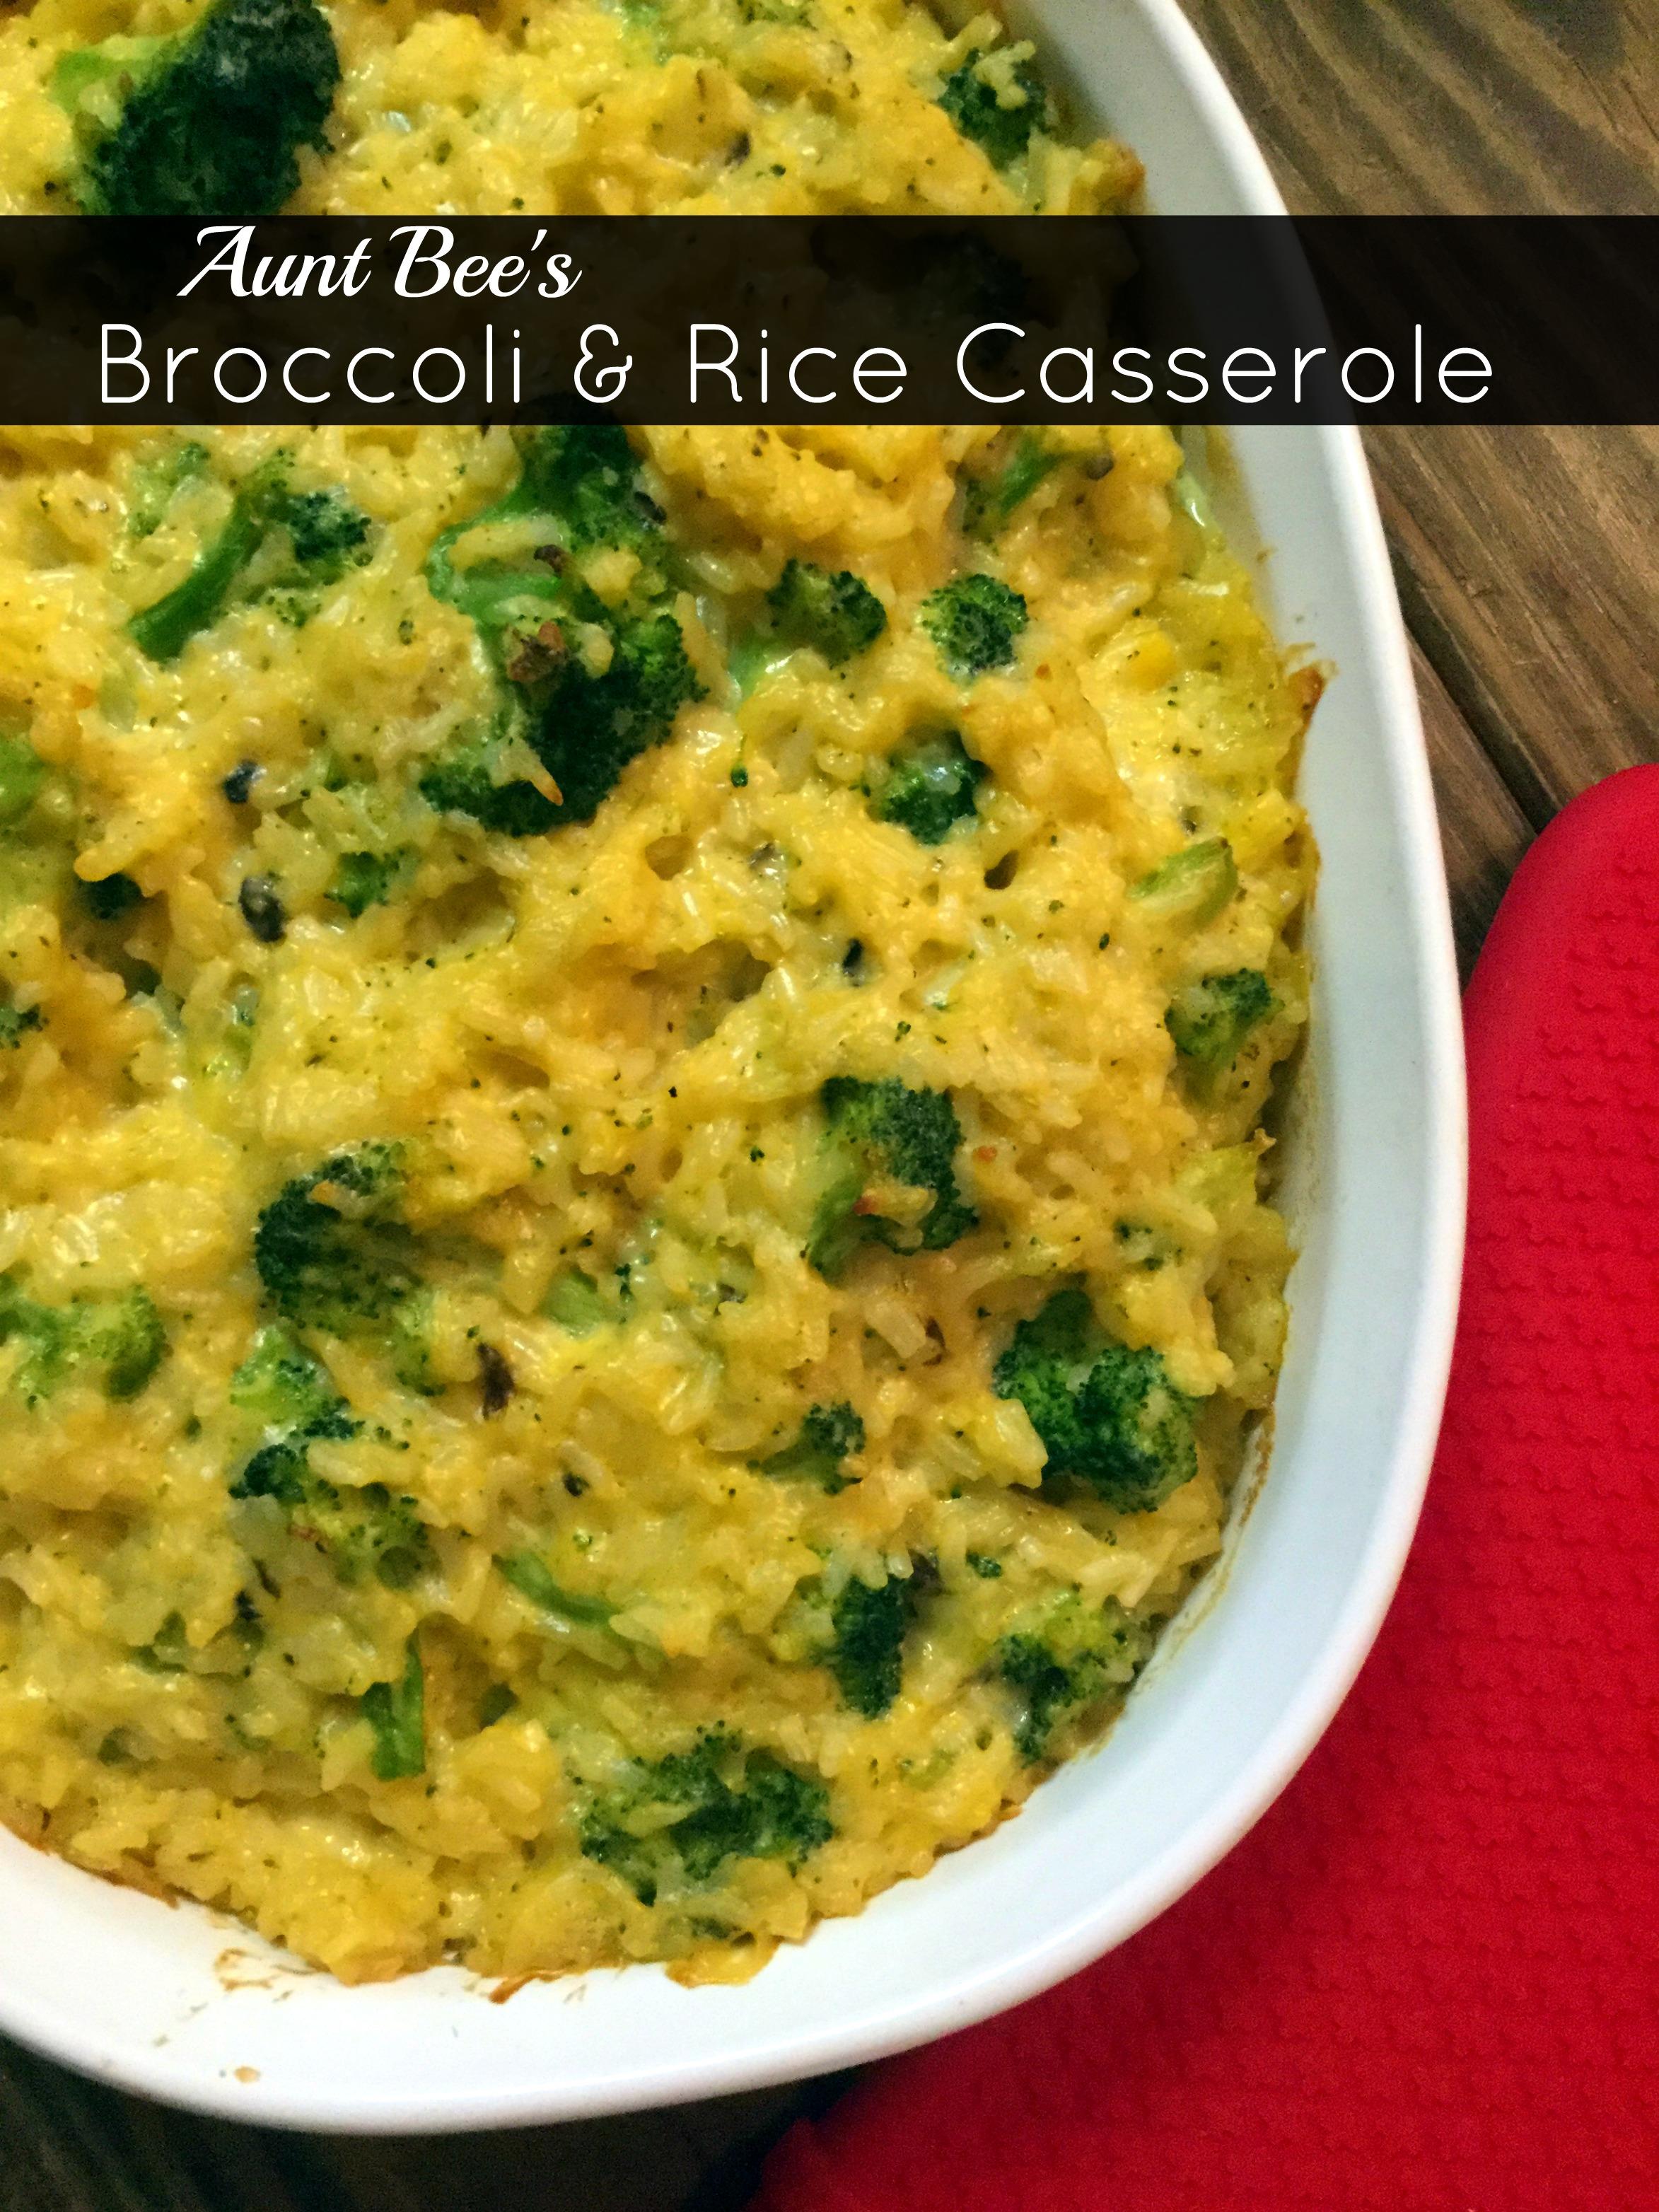 Broccoli & Rice Casserole | Aunt Bee's Recipes